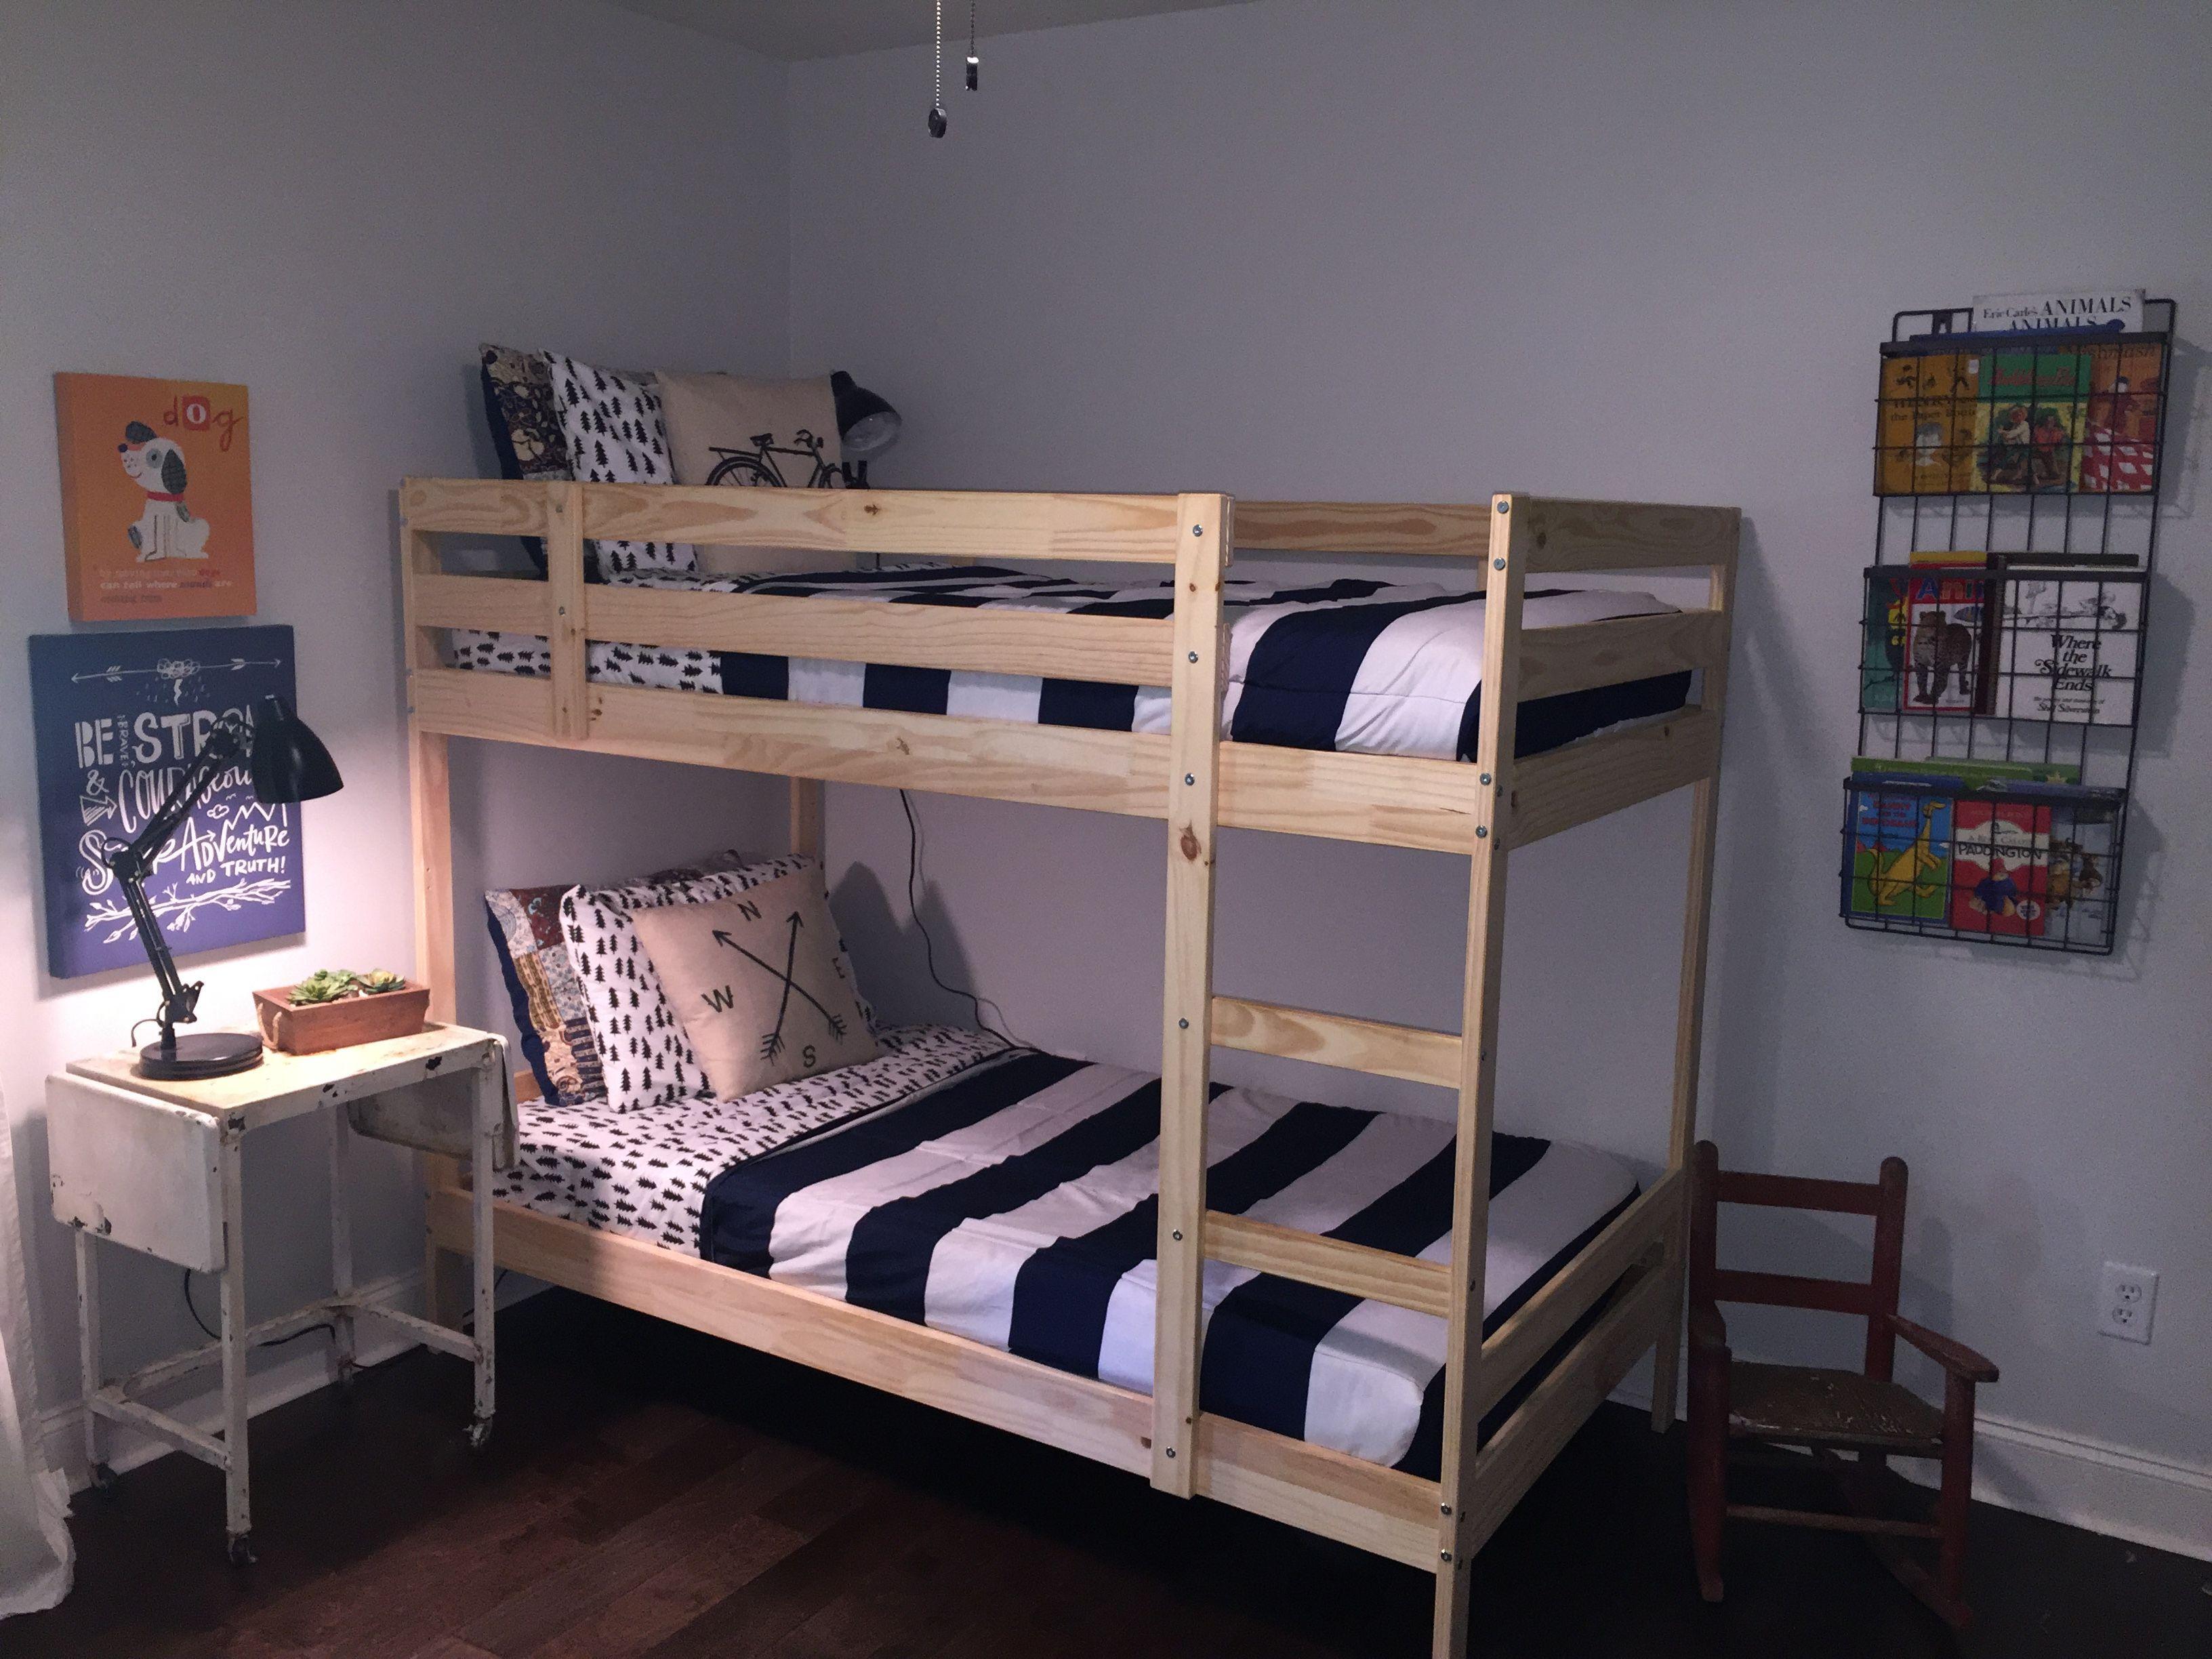 Ikea Mydal Bunk Beds Adventure Shared Boys Room Ikea Bunk Bed Bunk Beds With Stairs Bed For Girls Room